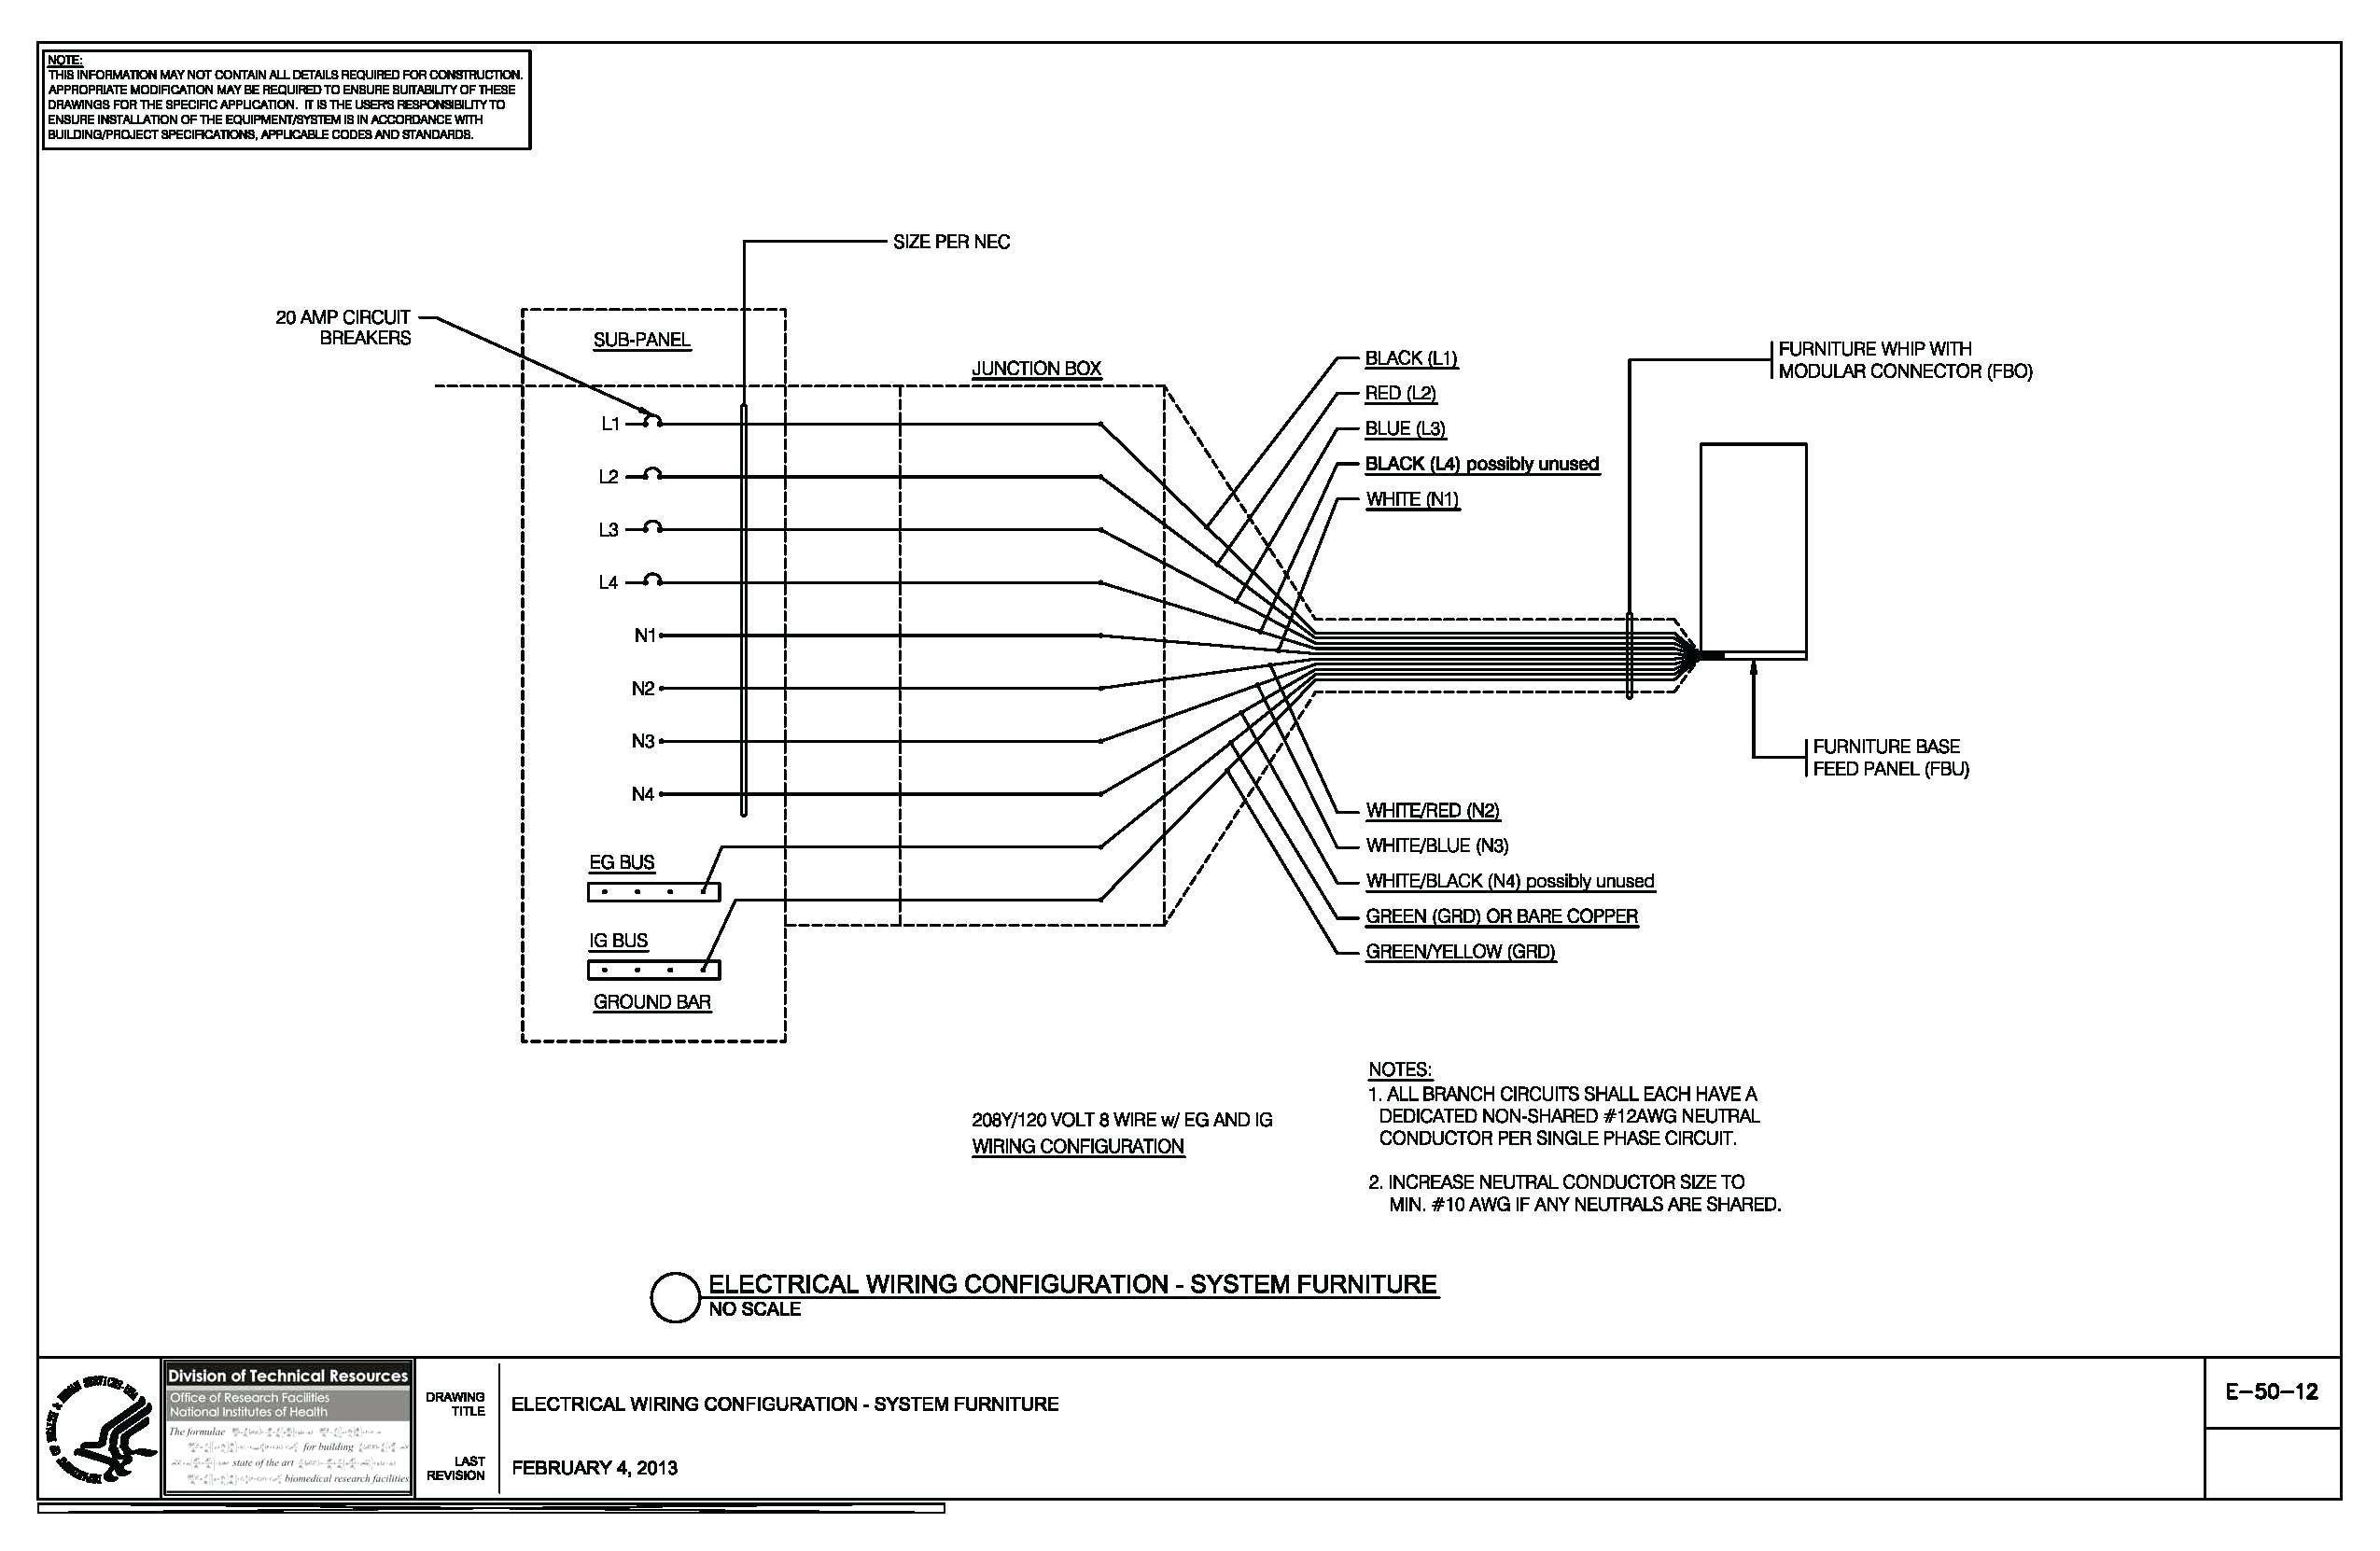 12v Starter solenoid Wiring Diagram Luxury Pretty 12 Volt solenoid Wiring Diagram Electrical and